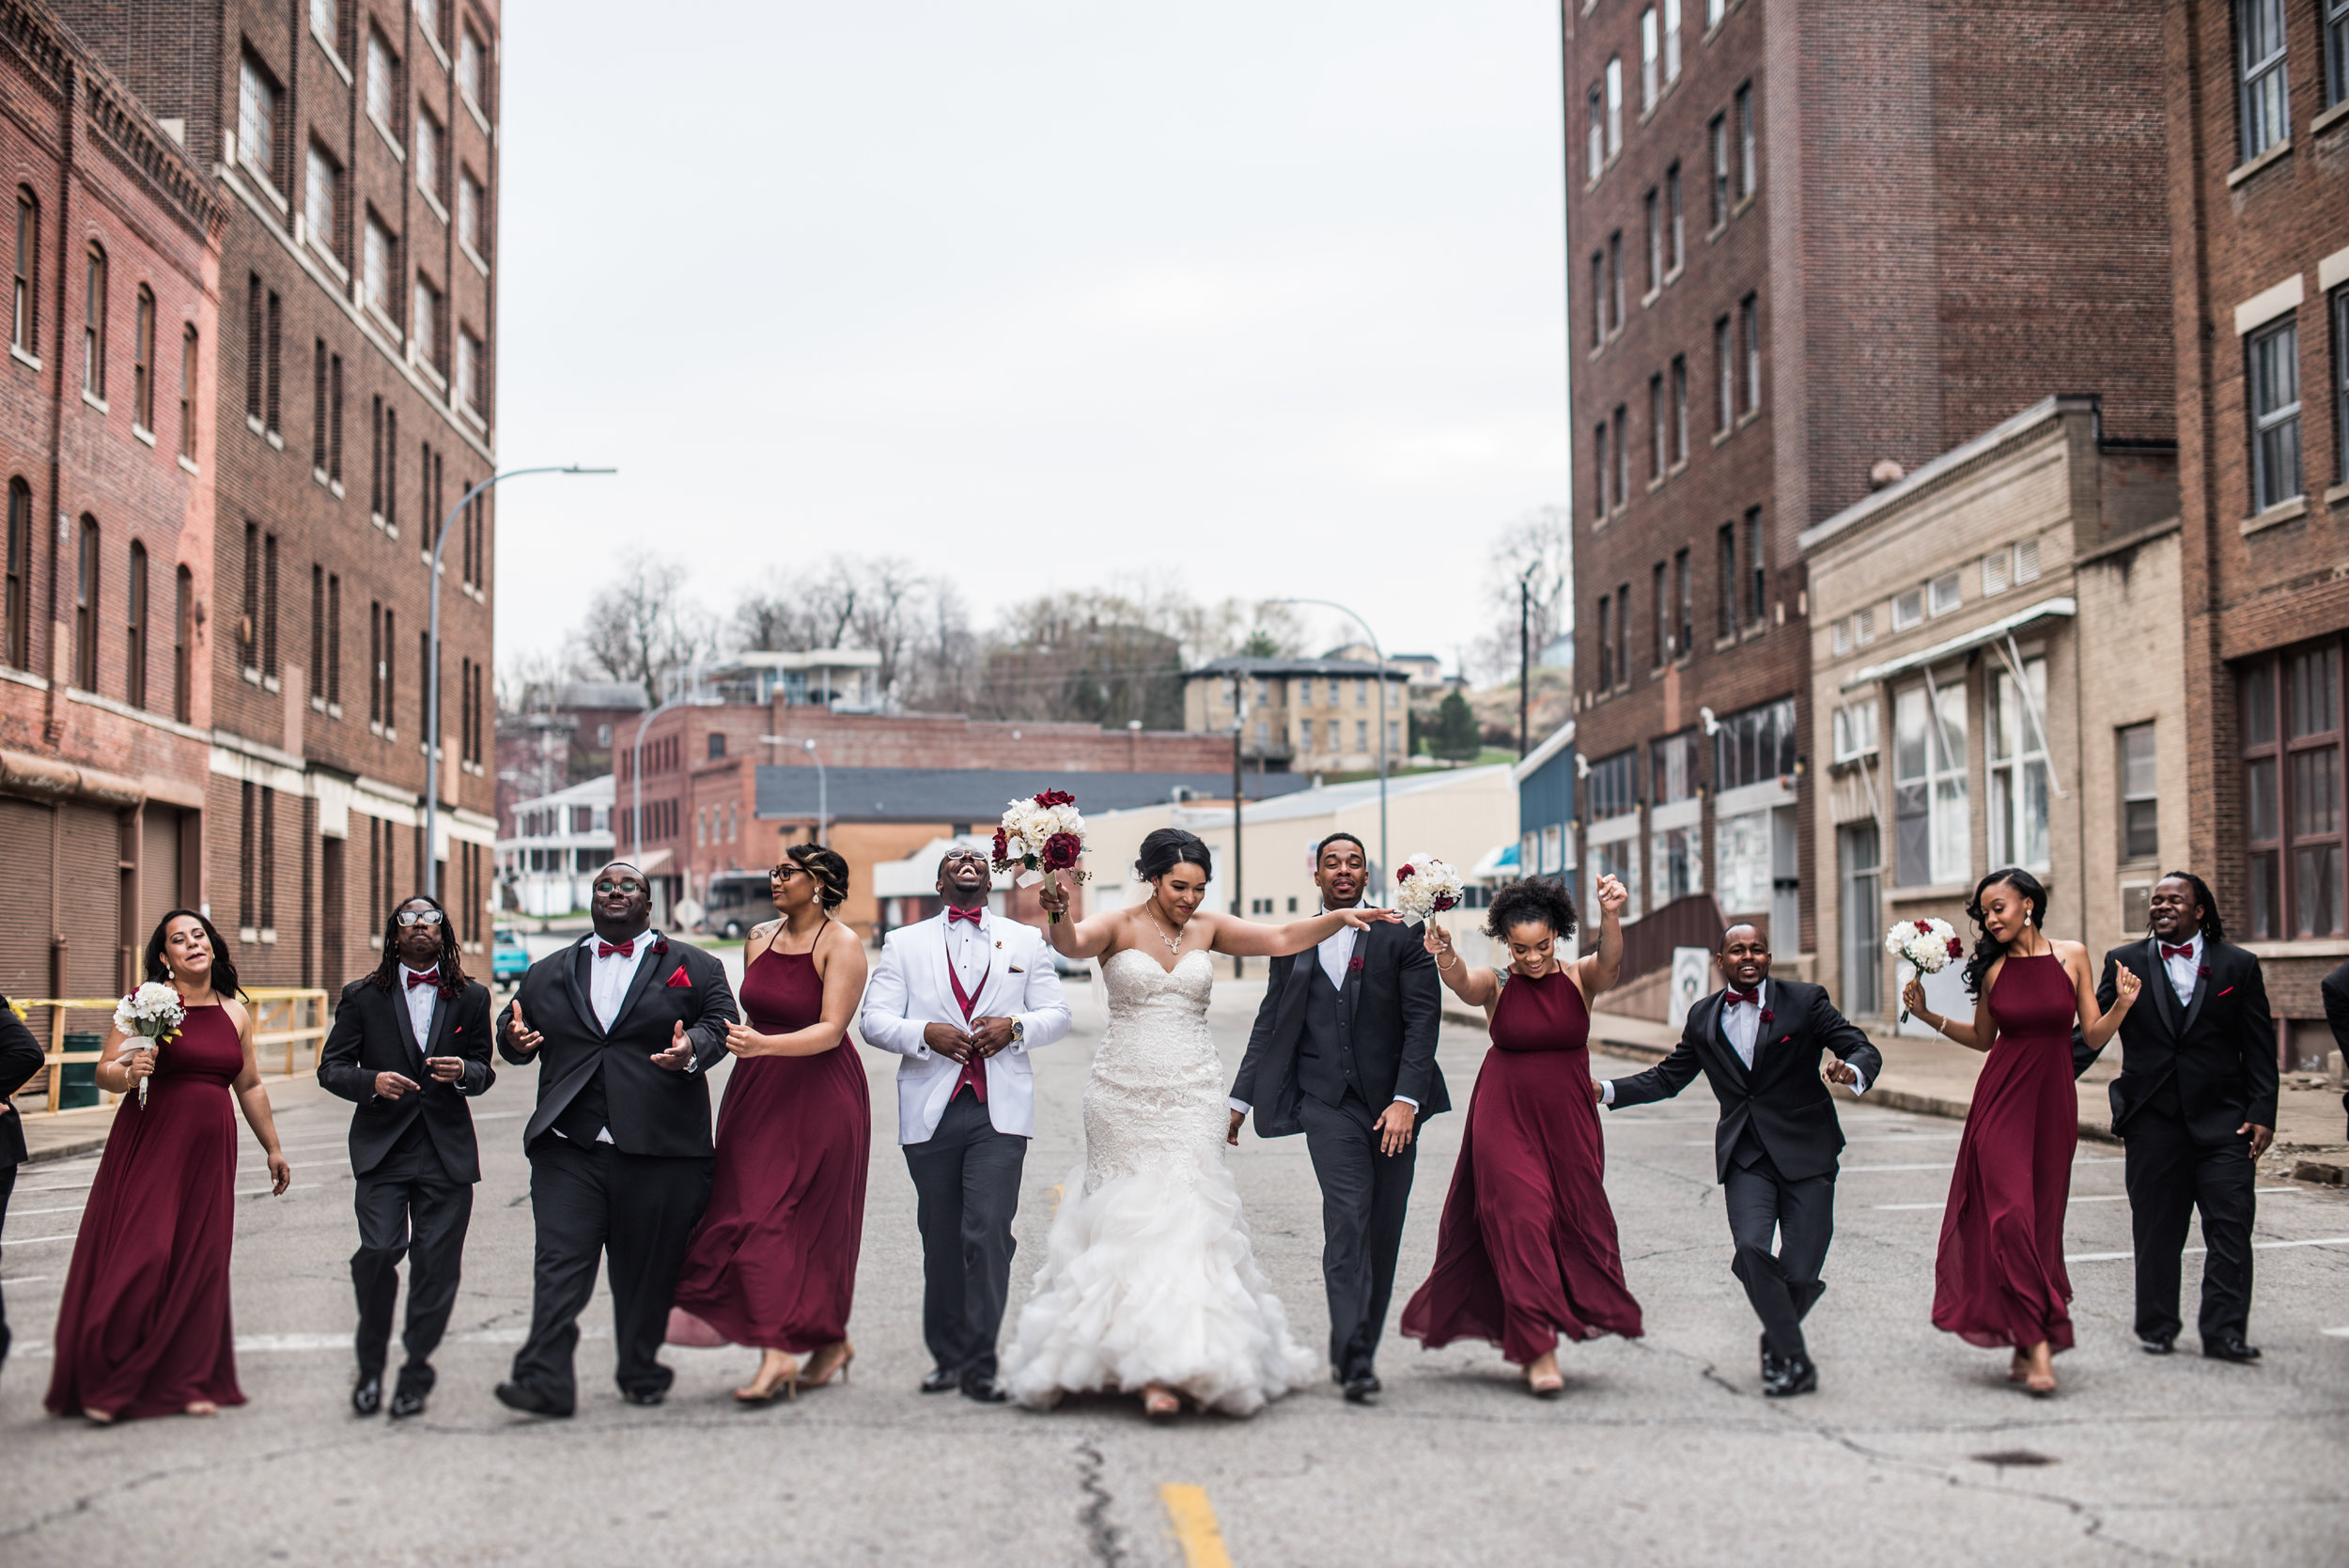 Burlington Iowa Wedding Midwest Photographer Melissa Cervantes _ Chantelle and Isaiah 555aa.jpg